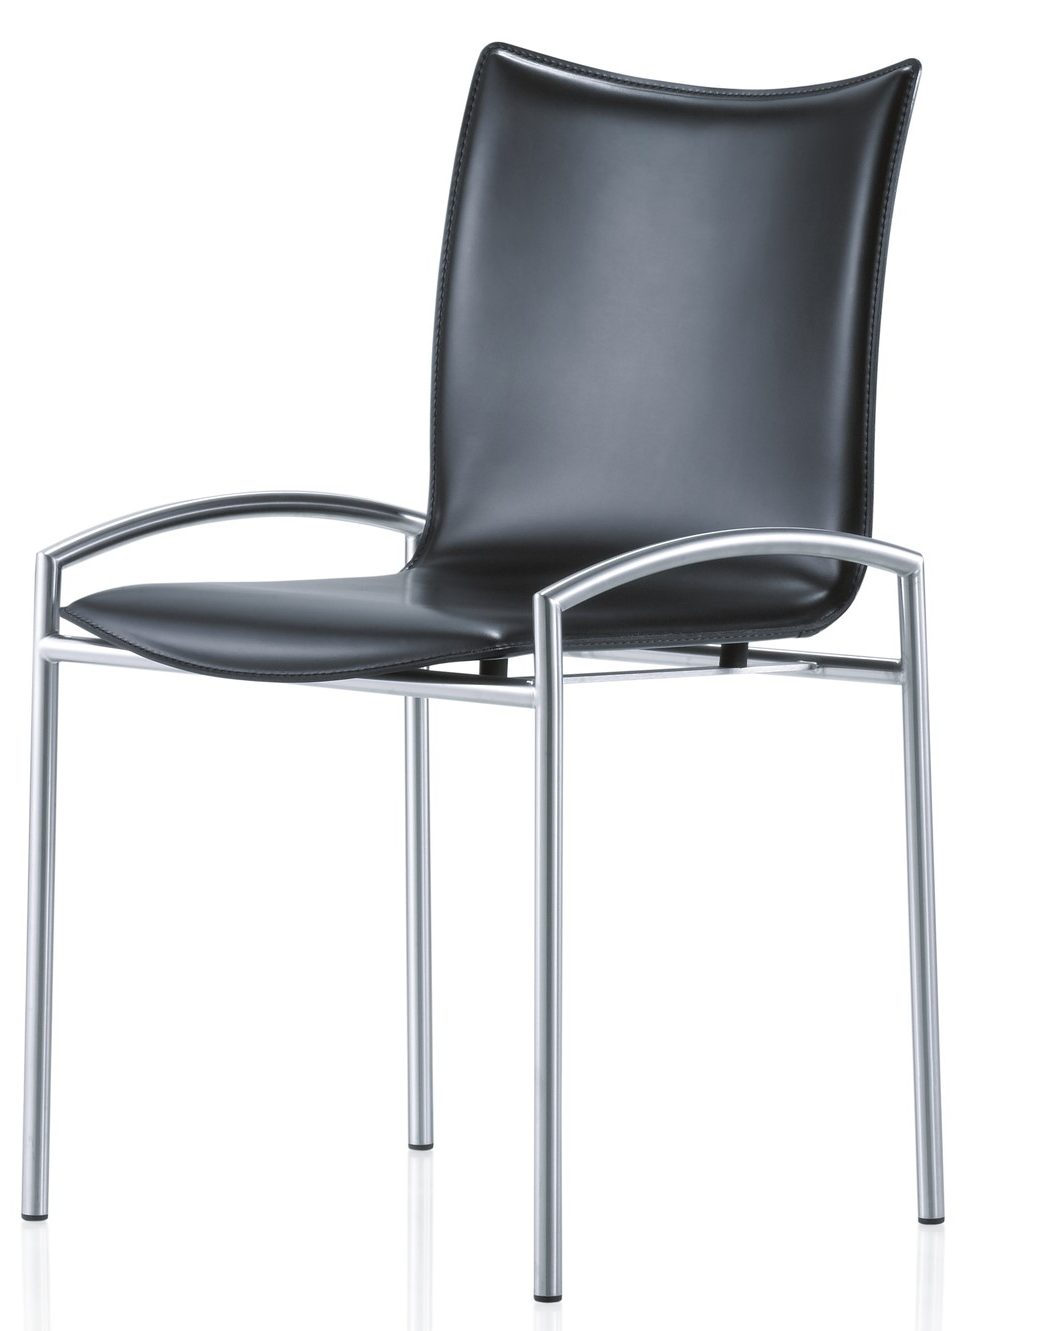 Girsberger Balzaro stoel